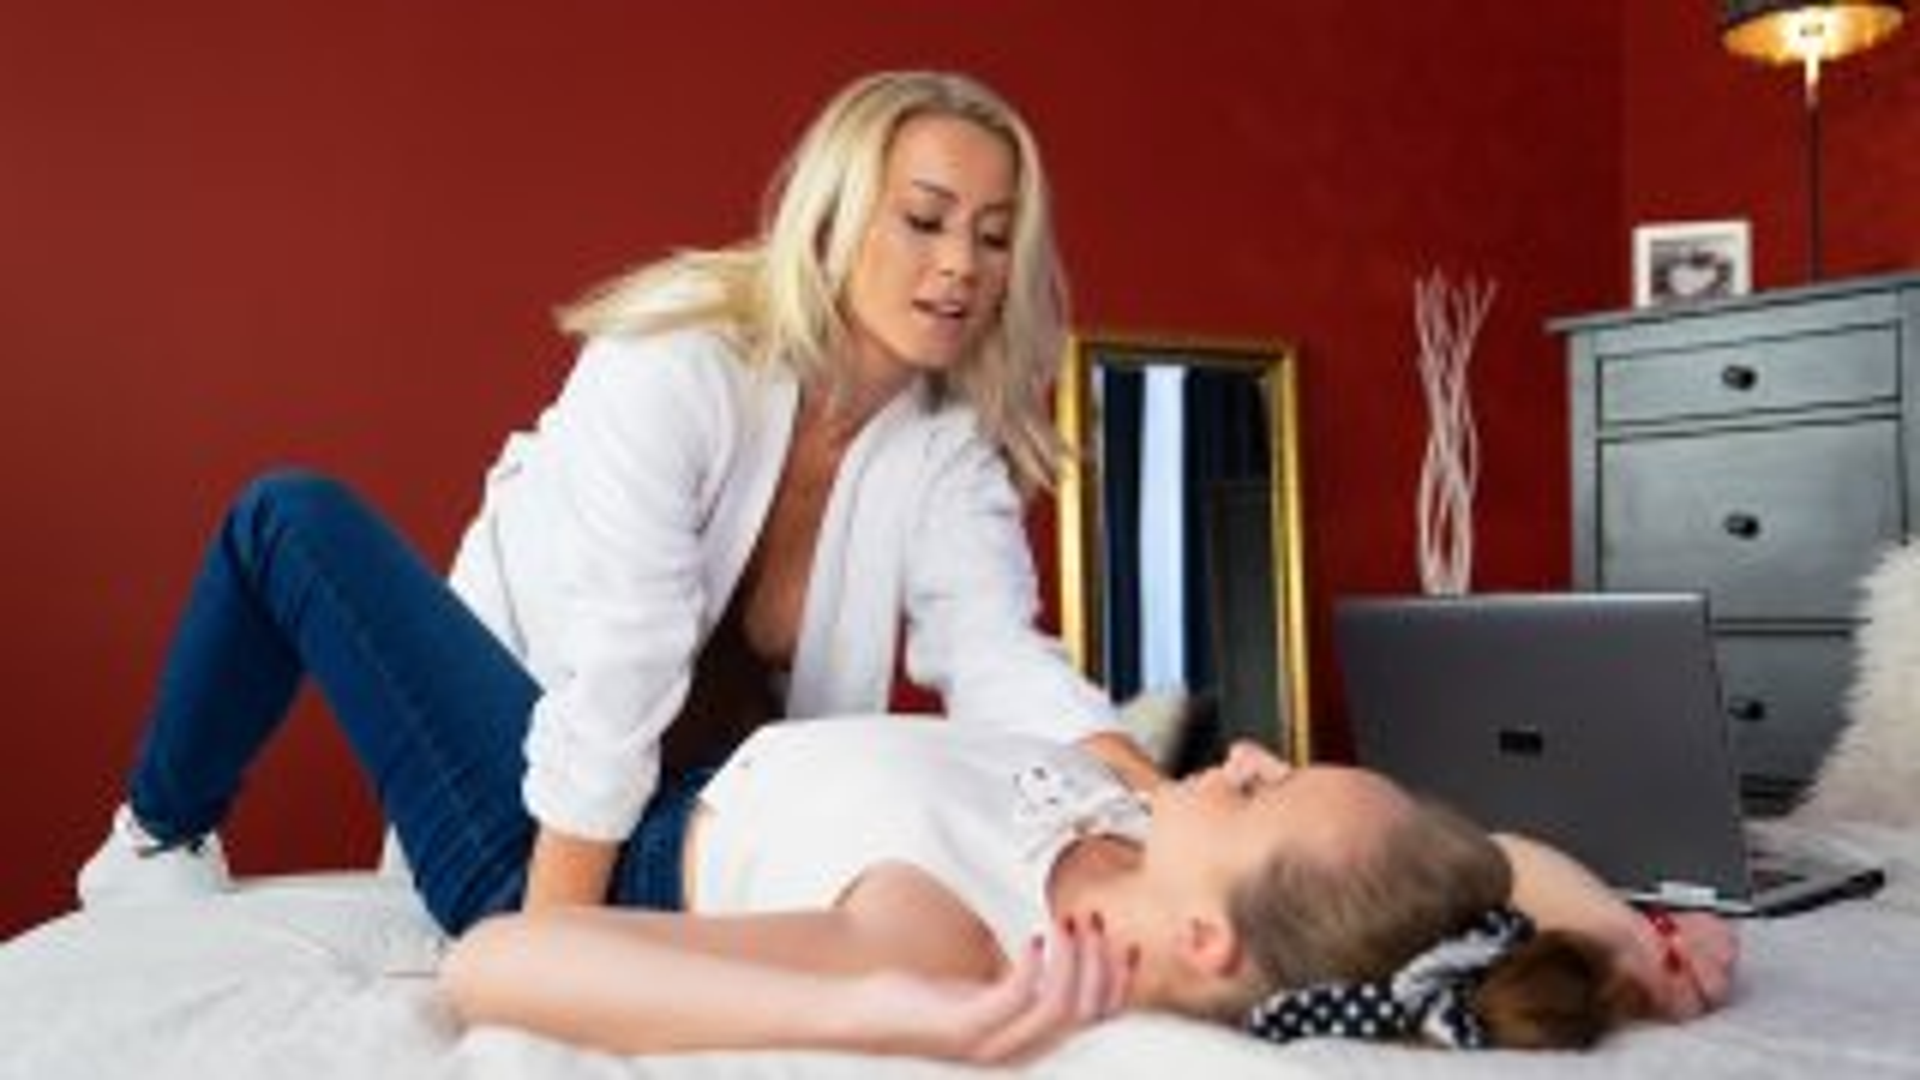 Unfulfilled wife has lesbian affair - Lesbea